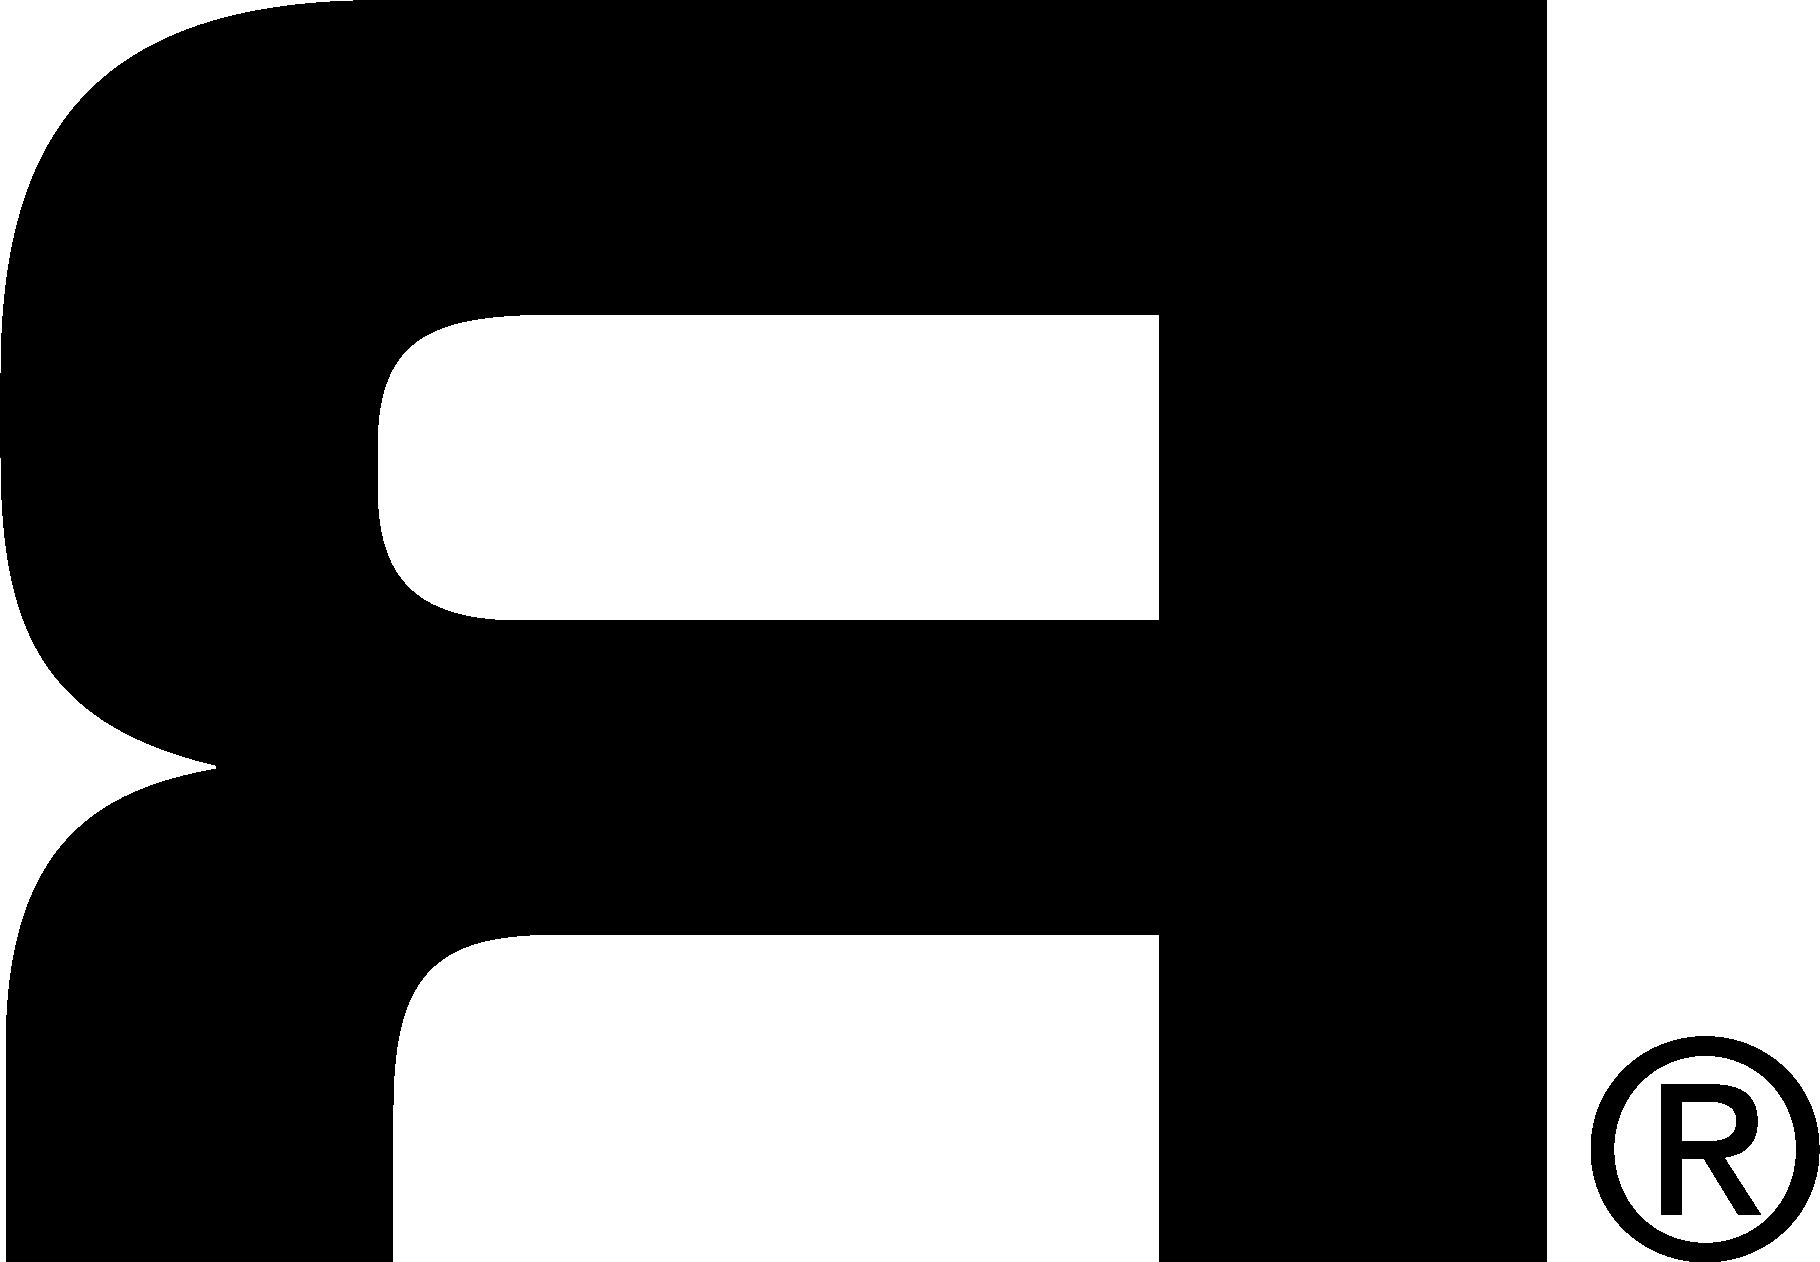 Rotorgroup